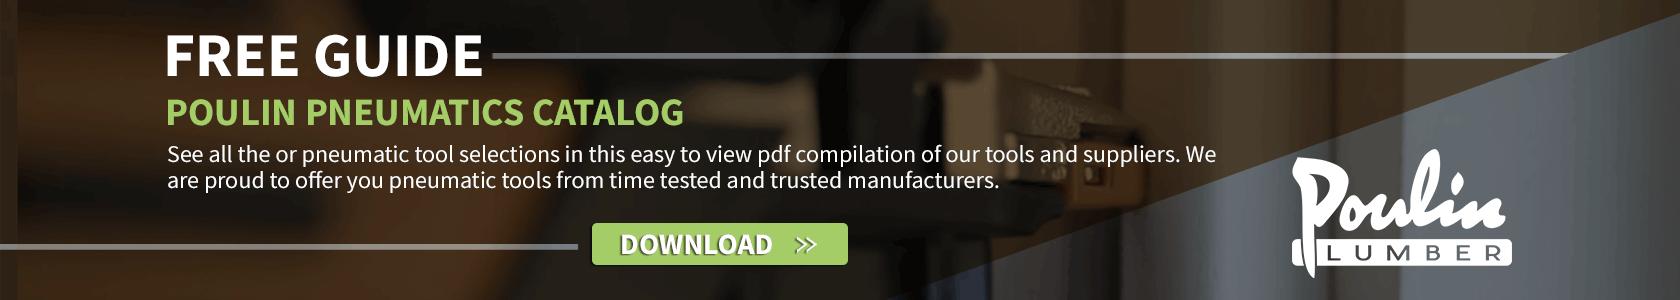 Pneumatics catalog offer